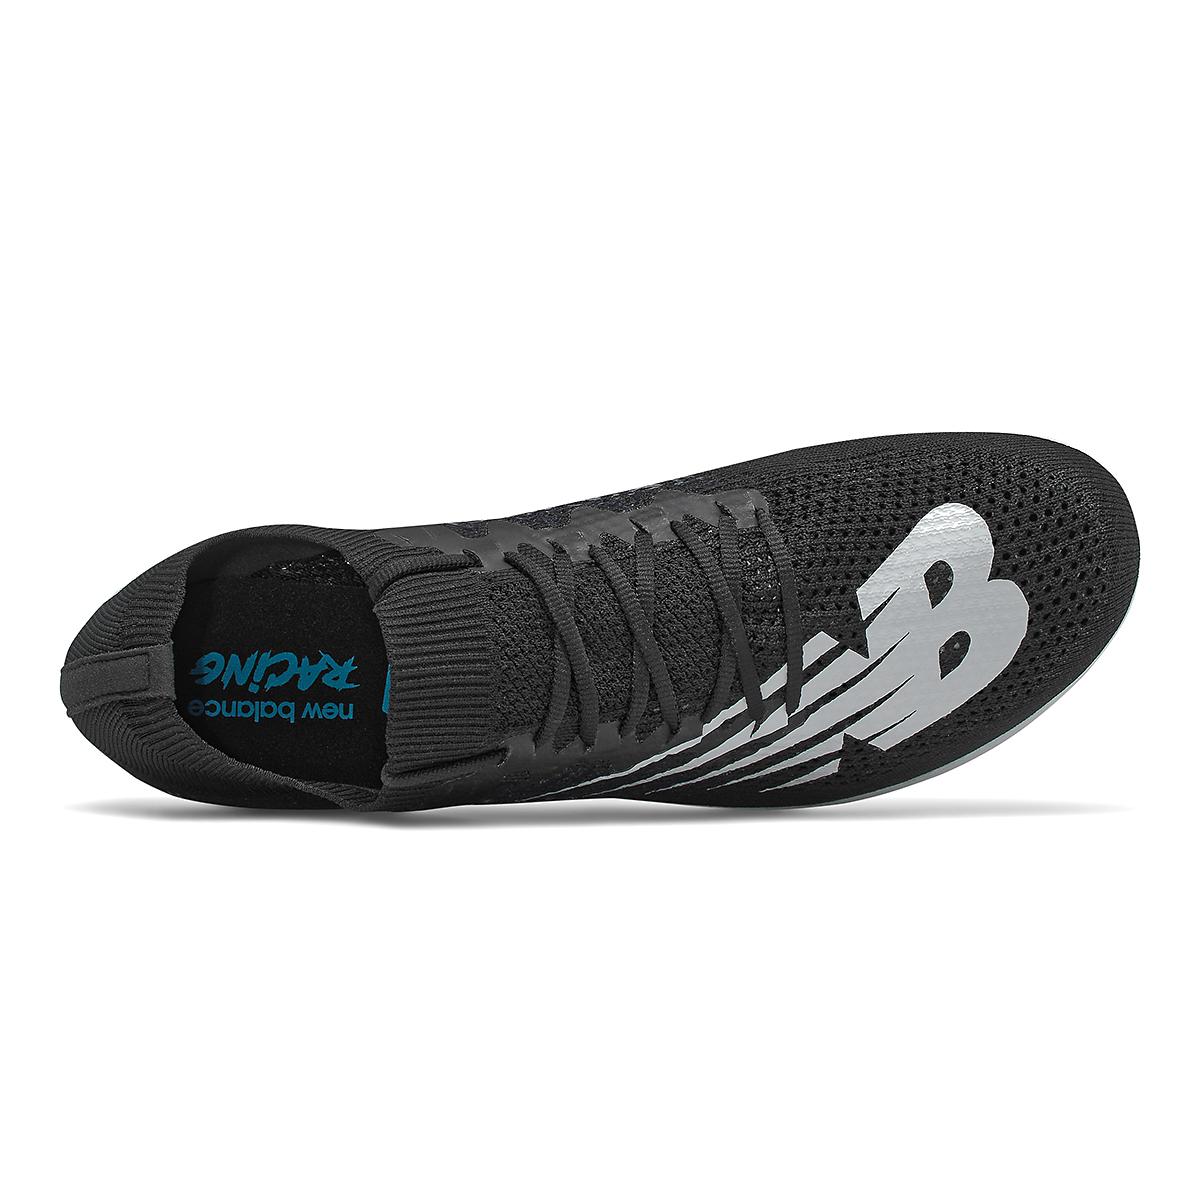 Men's New Balance LD5Kv8 Track Spikes - Color: Black/White - Size: 8 - Width: Regular, Black/White, large, image 3